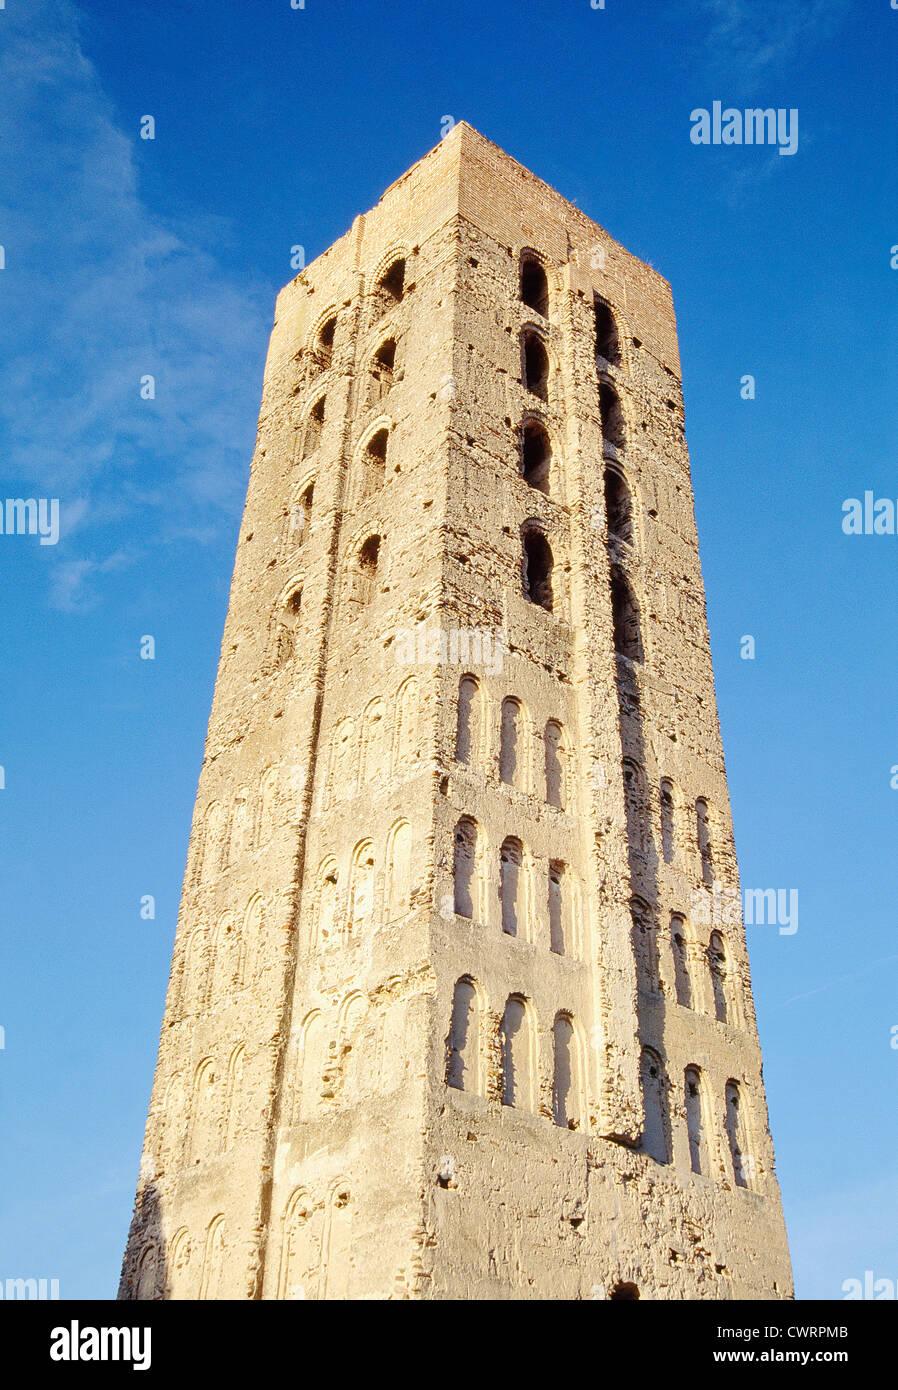 San Nicolas tower. Coca, Segovia province, Castilla Leon, Spain. - Stock Image